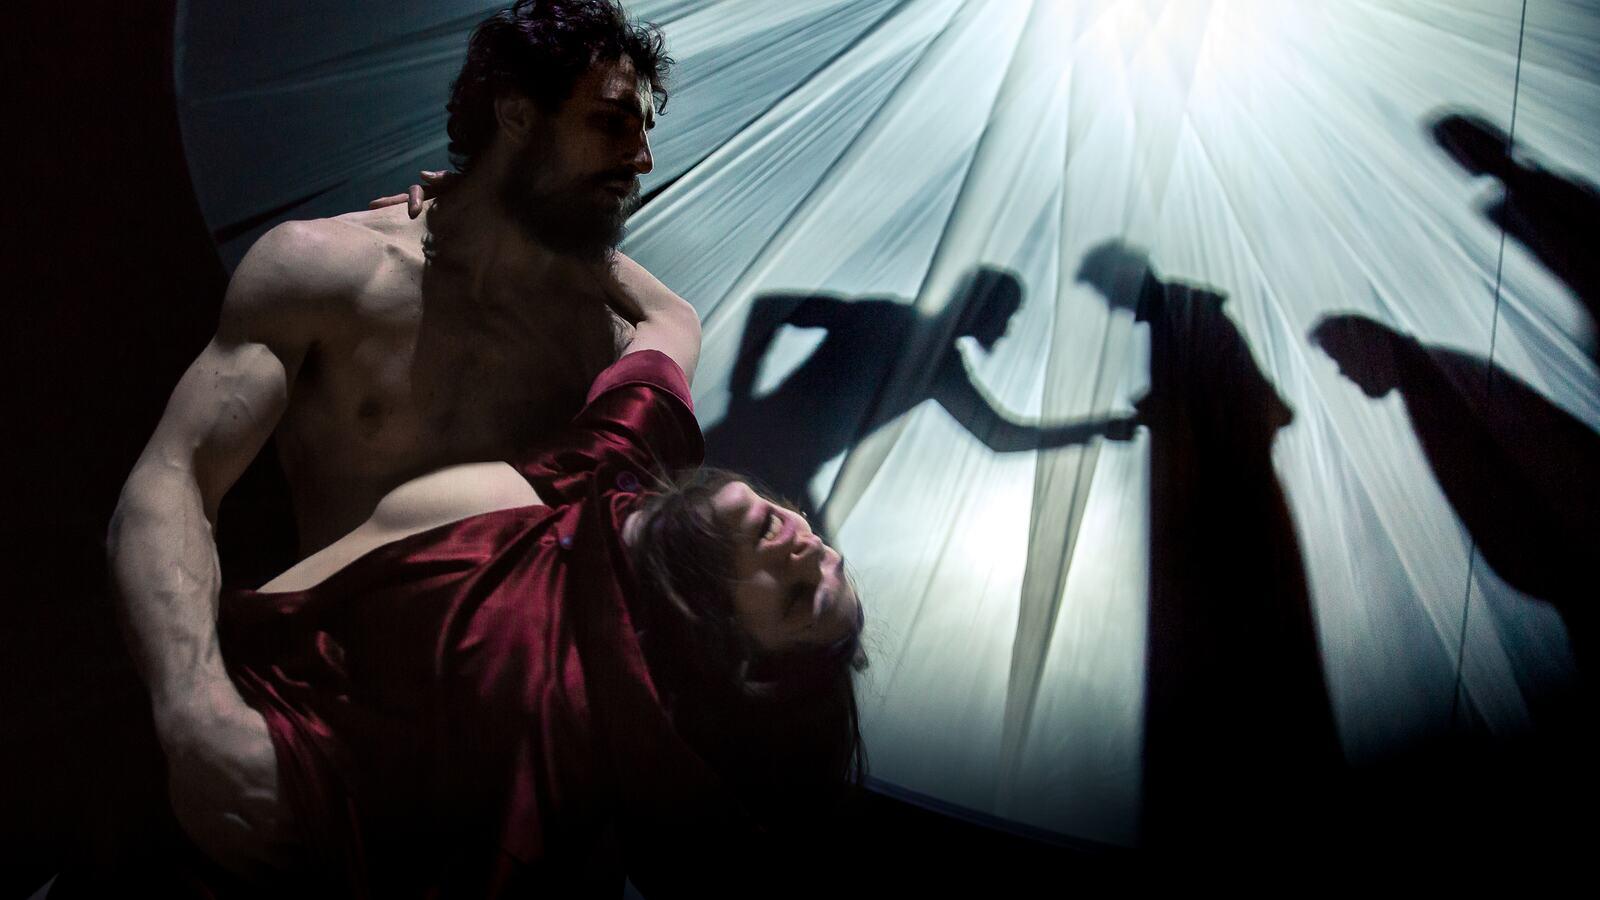 Mockumentary of a Contemporary Saviour on stage